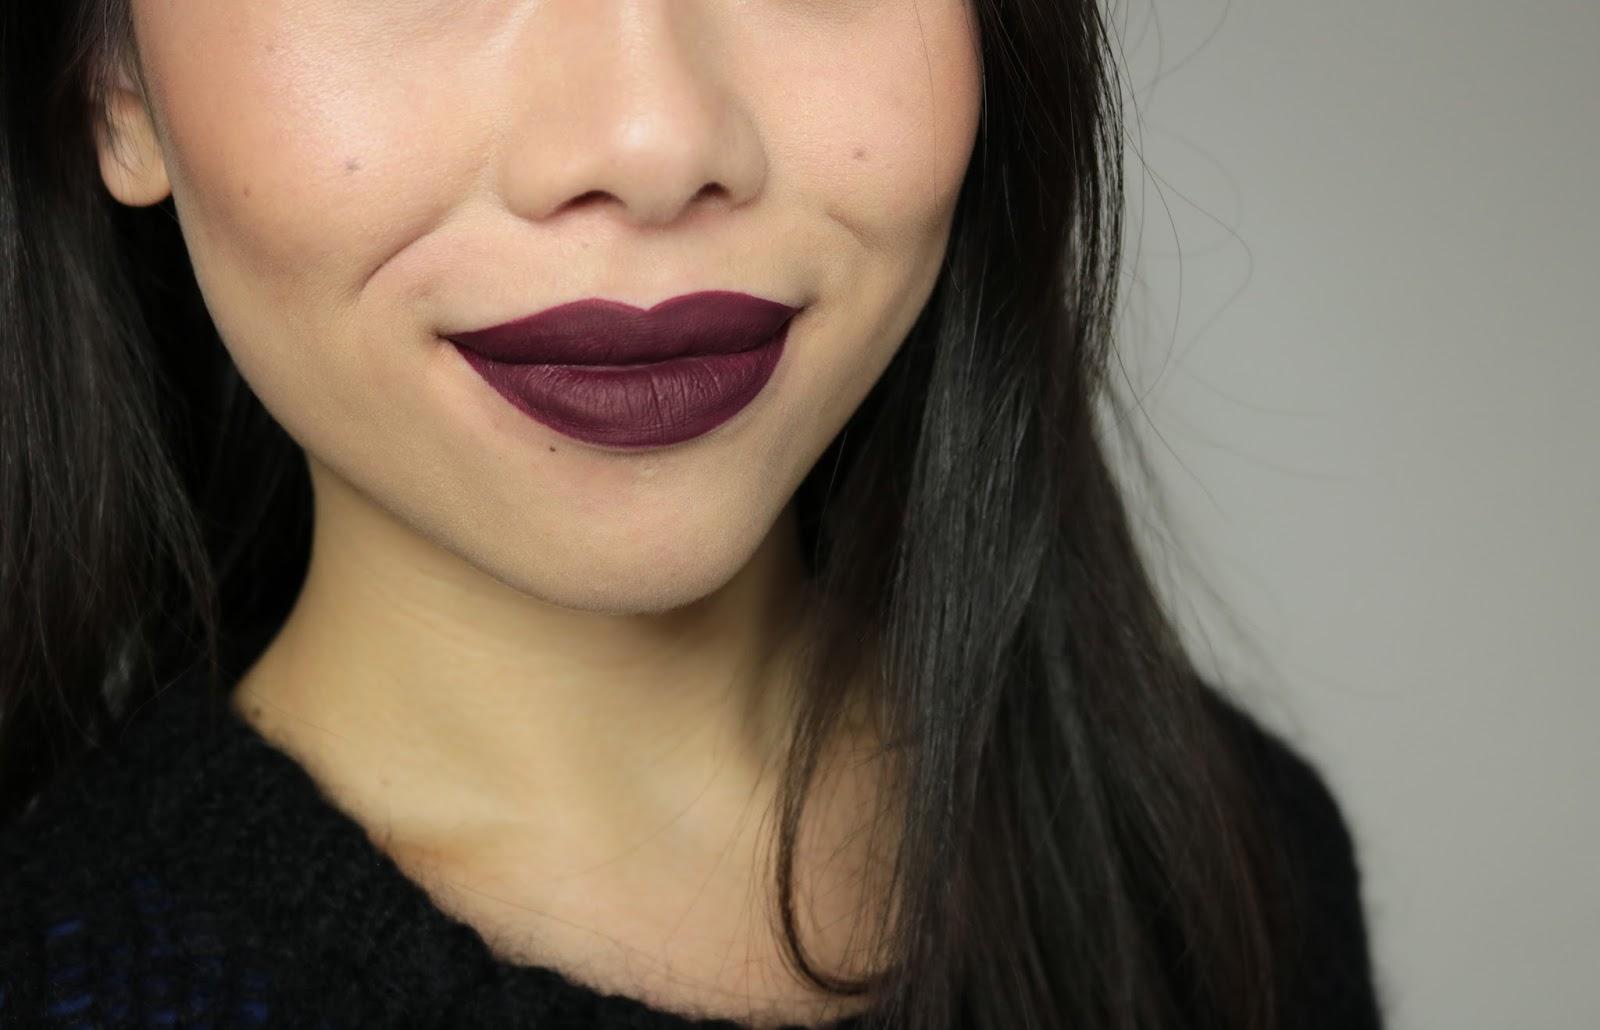 Les Everlasting Liquid Lipsticks de Kat Von D Exorcism